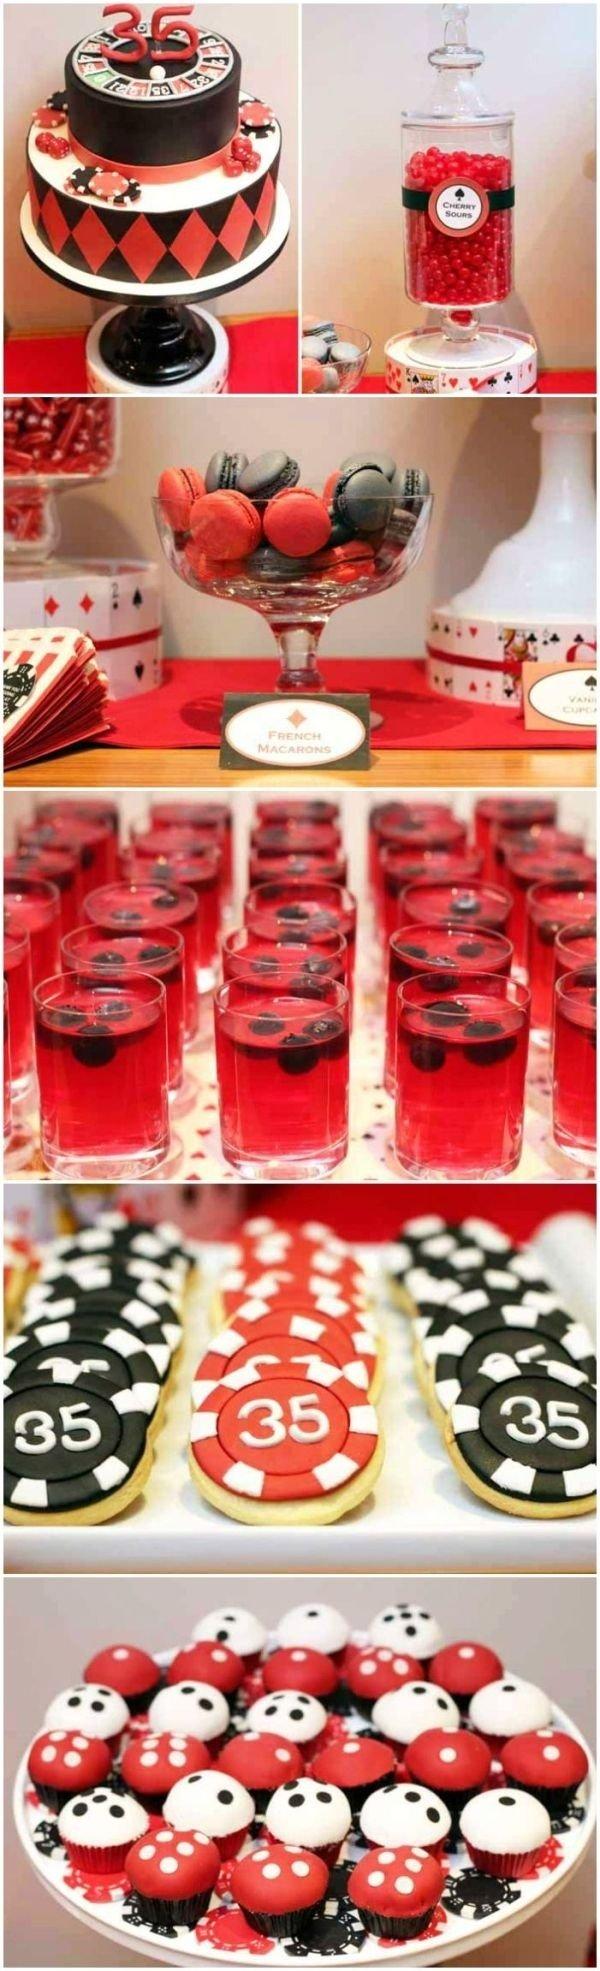 10 Attractive Kids Birthday Party Ideas Las Vegas 65 best casino night images on pinterest birthdays vegas party 2020